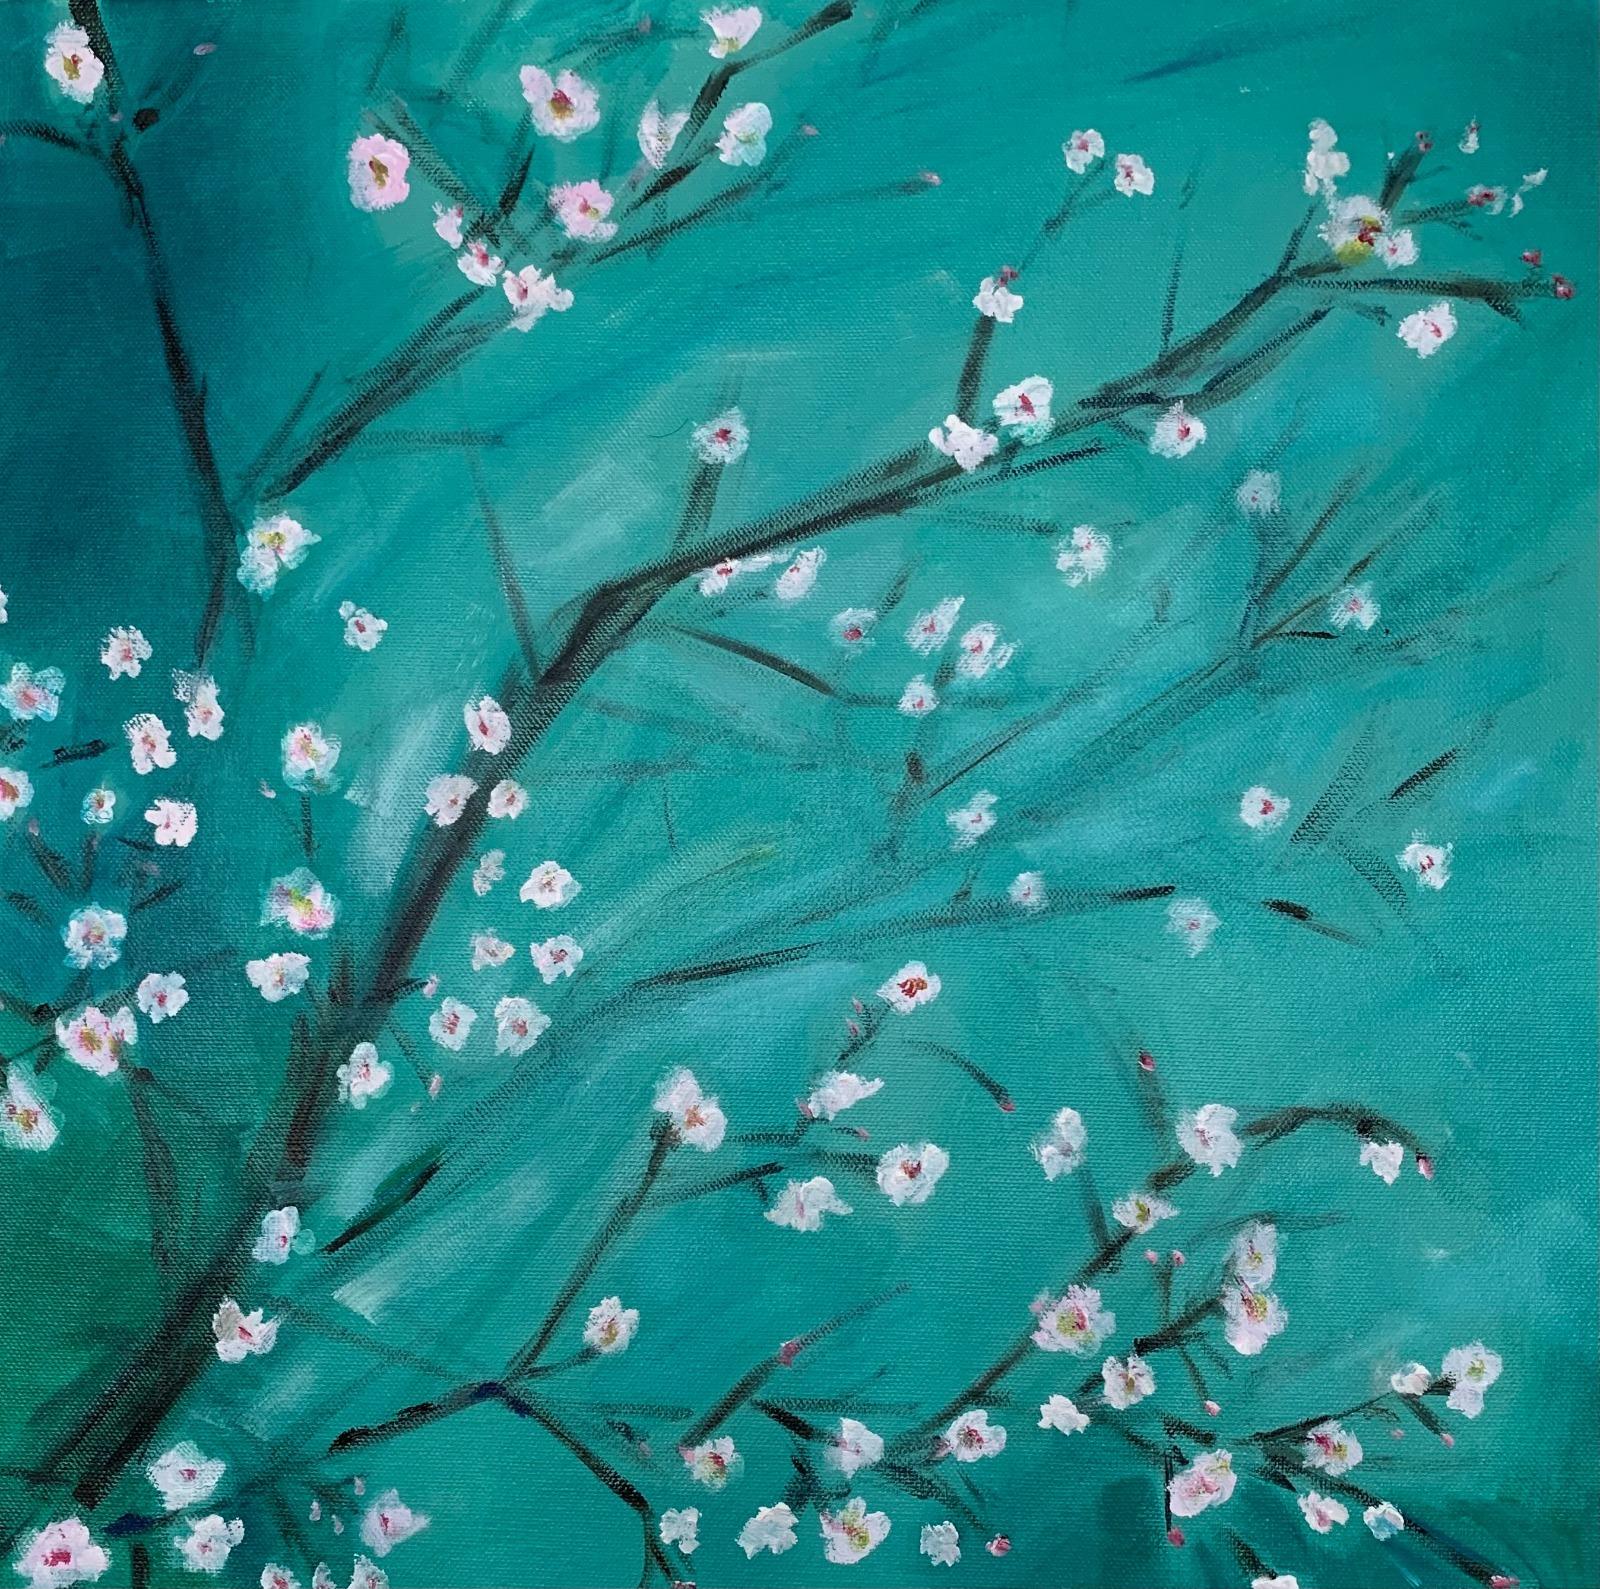 Blossoms Emerging 1